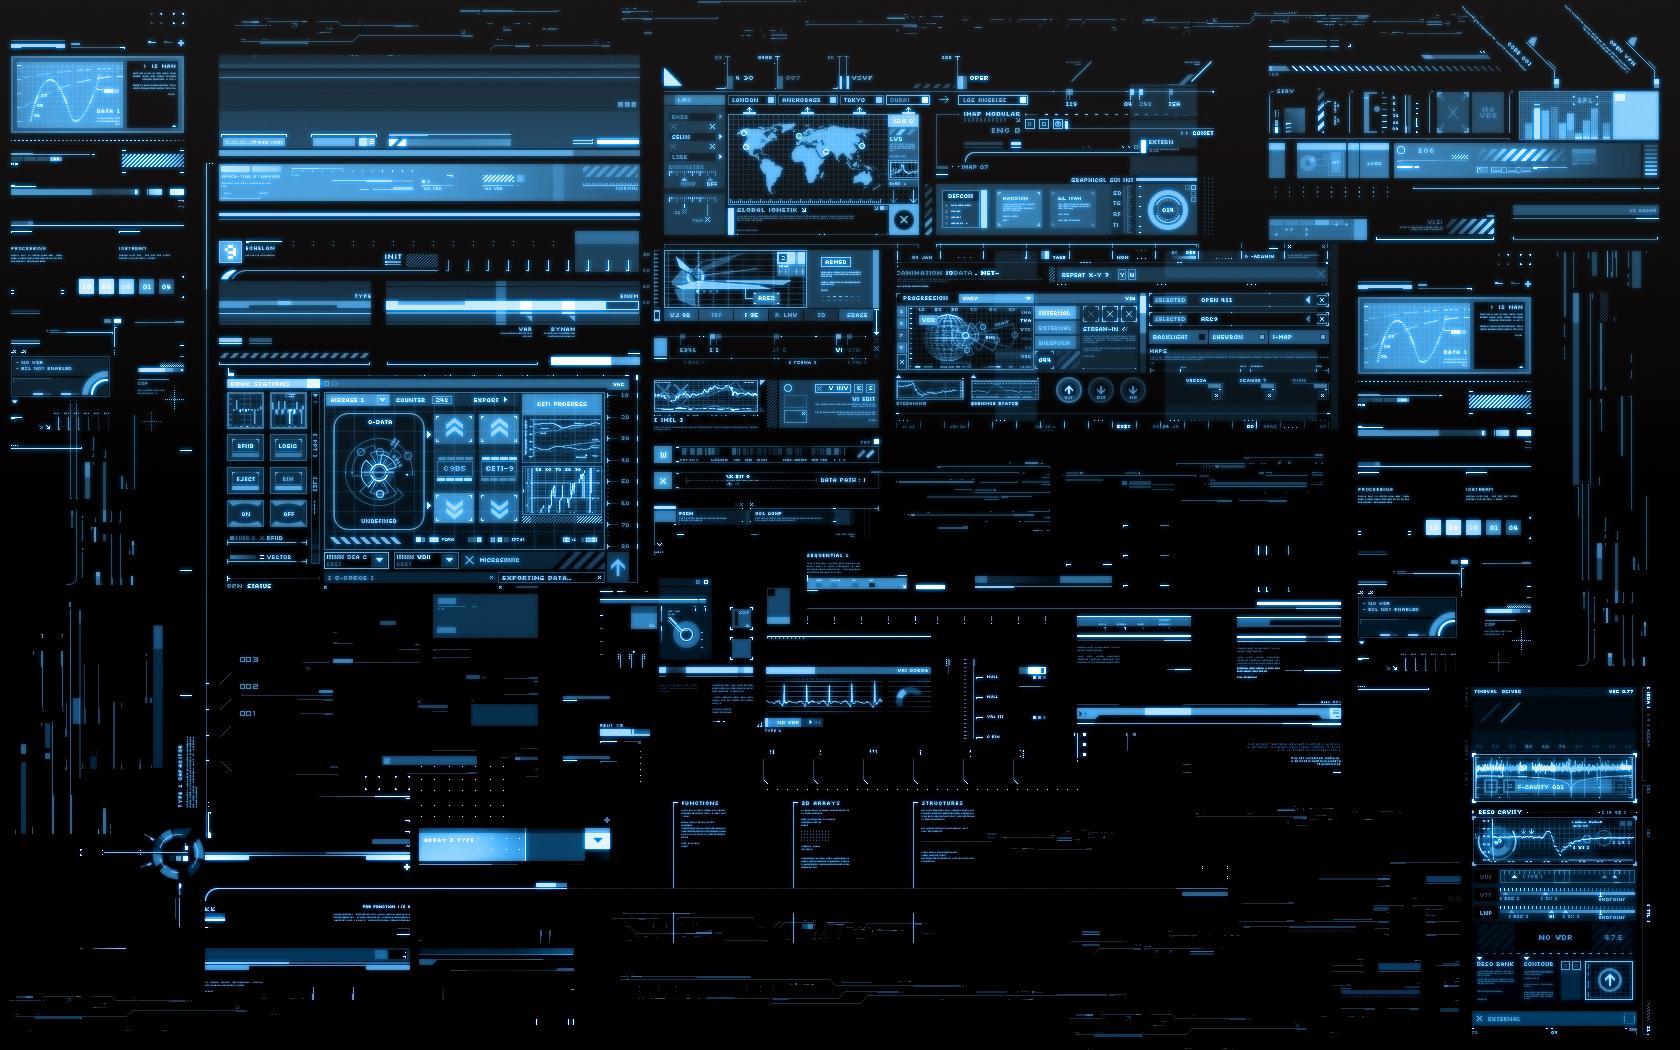 HD Desktop Technology Wallpaper Backgrounds For Download 1680x1050